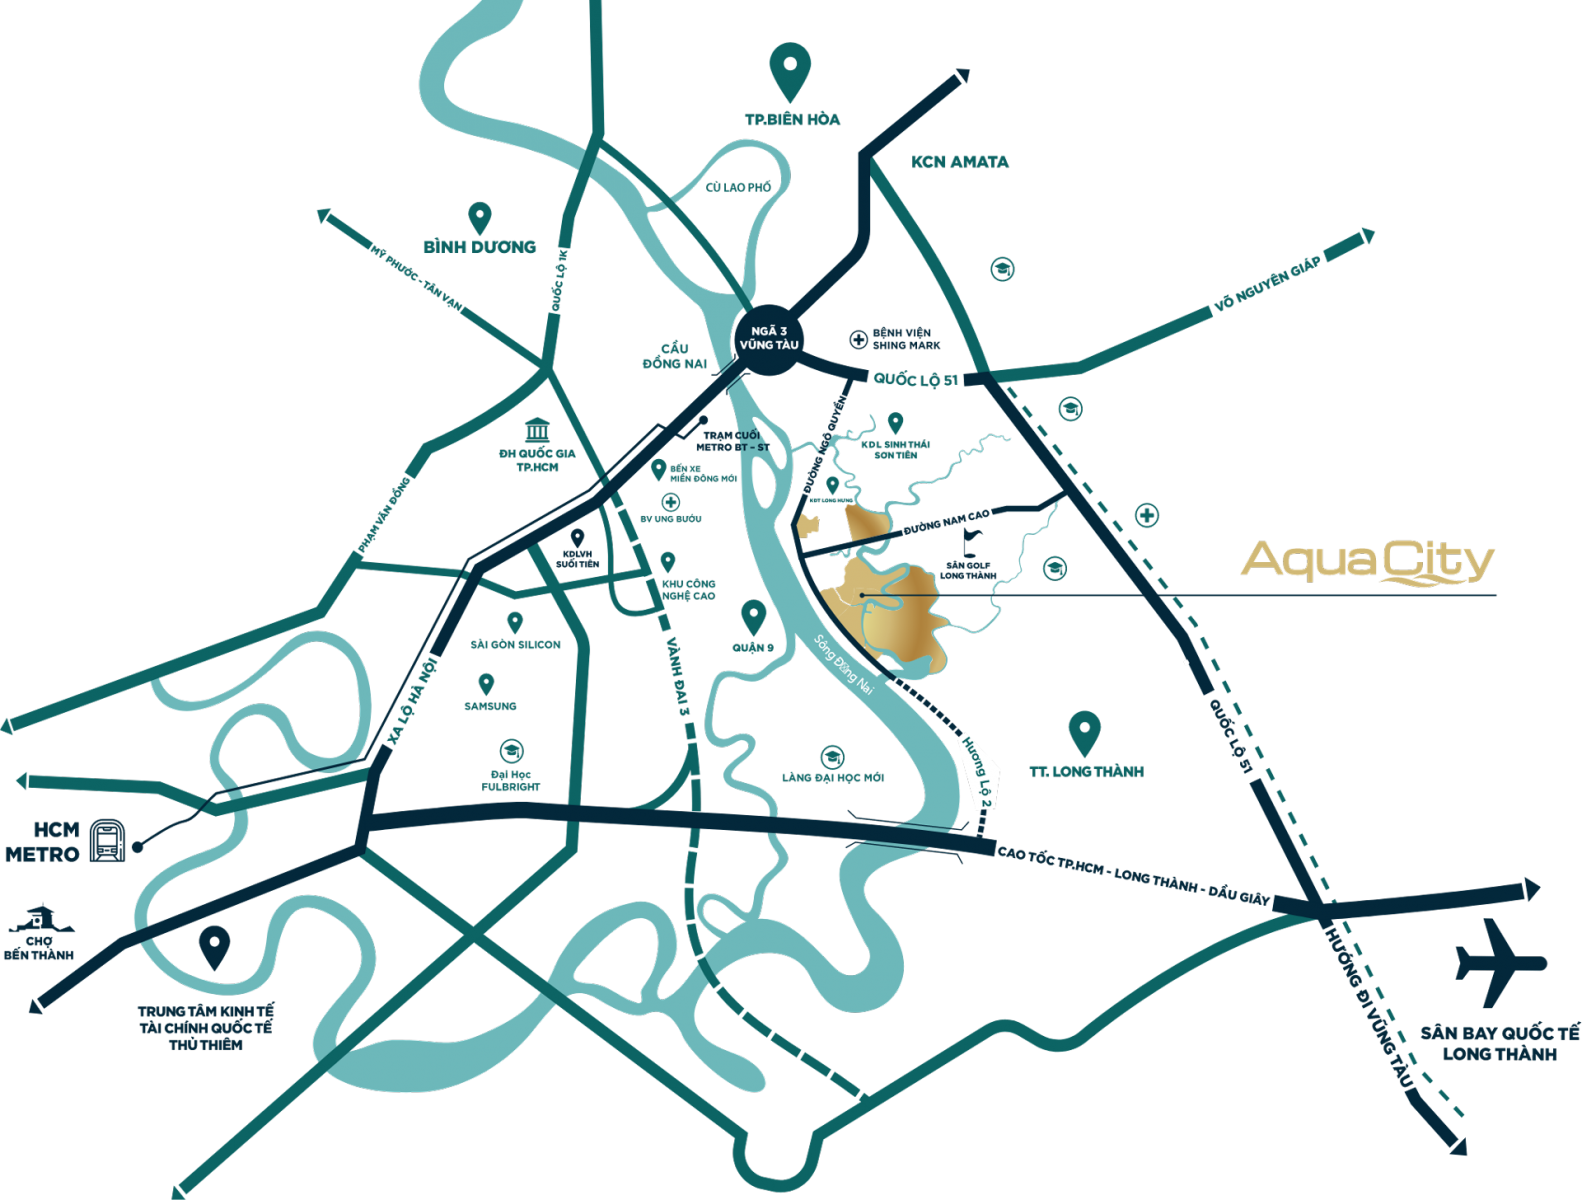 Bản đồ dự án aqua city